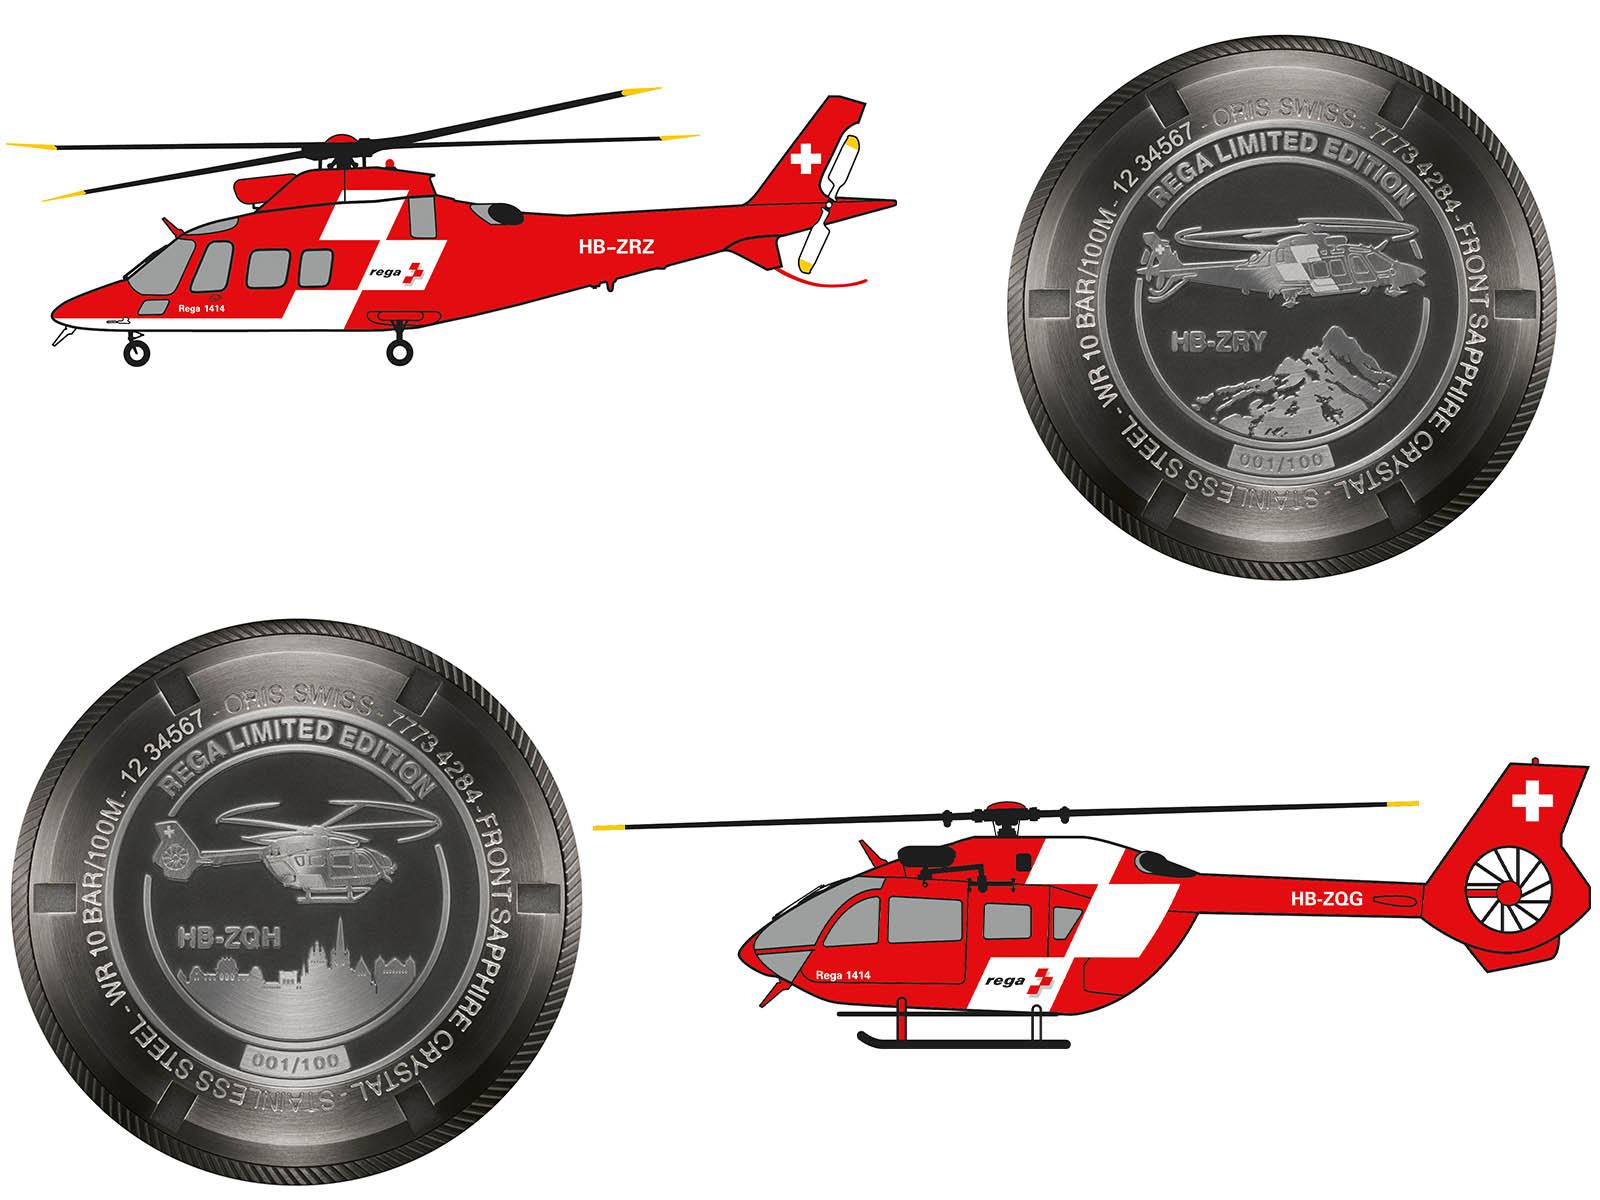 798-7773-4284-set-oris-big-crown-propilot-rega-fleet-limited-edition-5.jpg